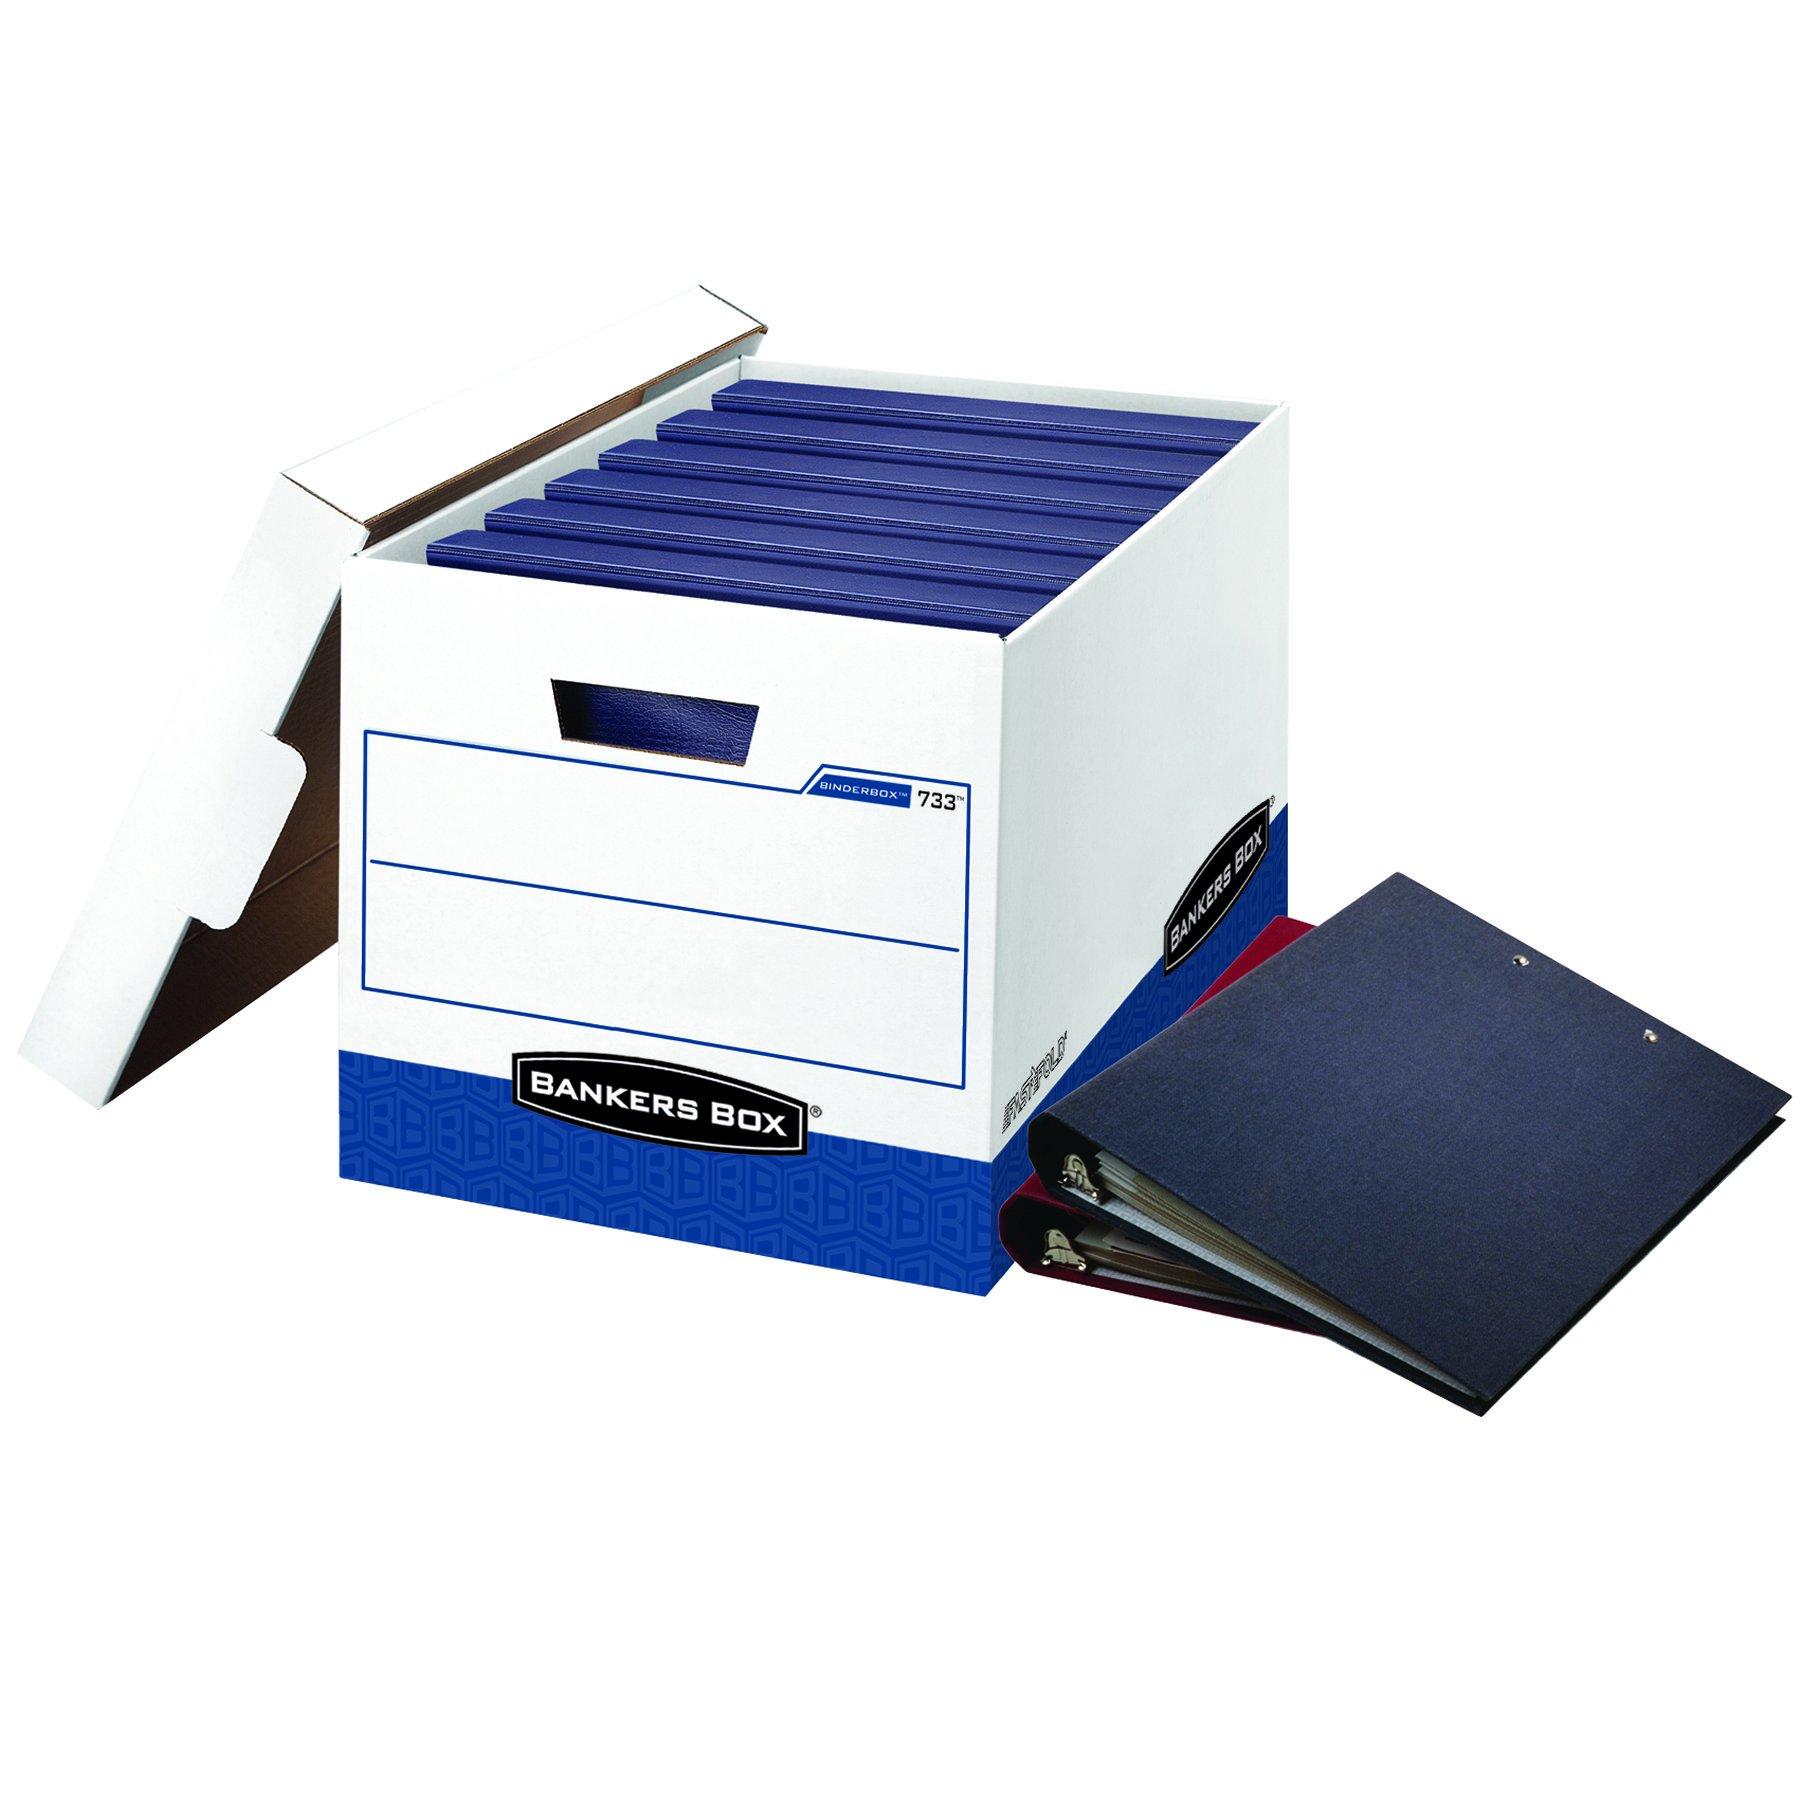 Bankers Box 0073301 BINDERBOX Storage Box, Locking Lid, 12 1/4 x 18 1/2 x 12, White/Blue (Case of 12)